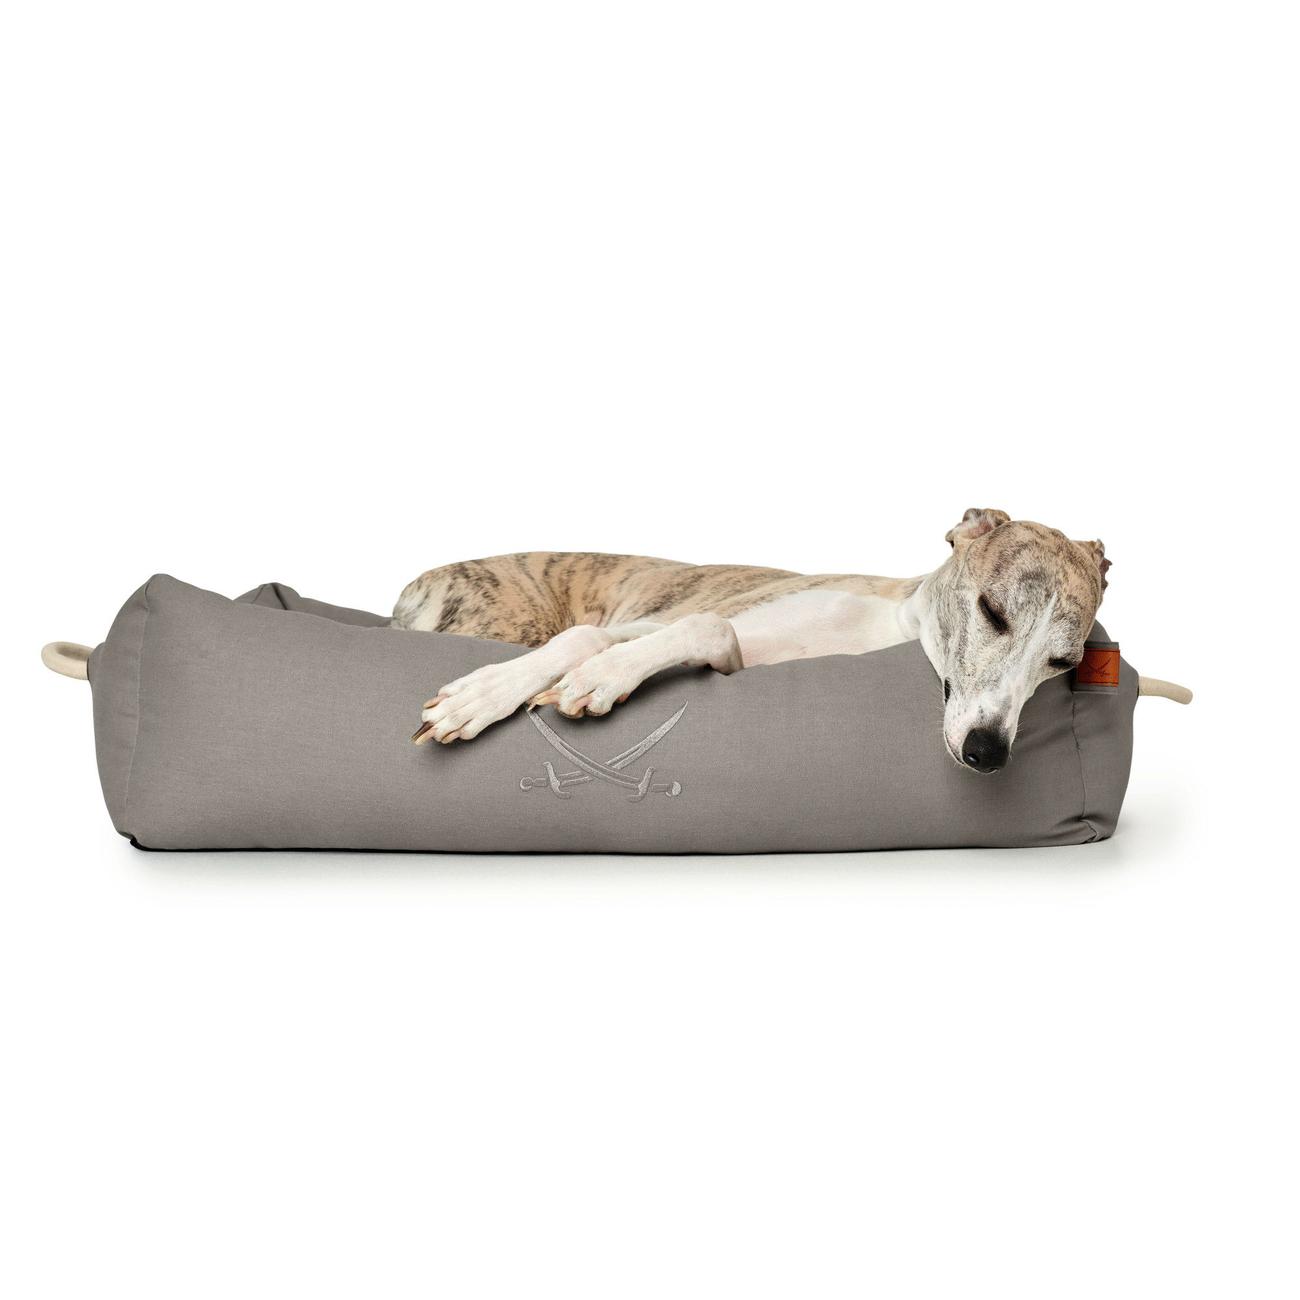 Hunter Hundesofa Sansibar Rantum 65652, Bild 3